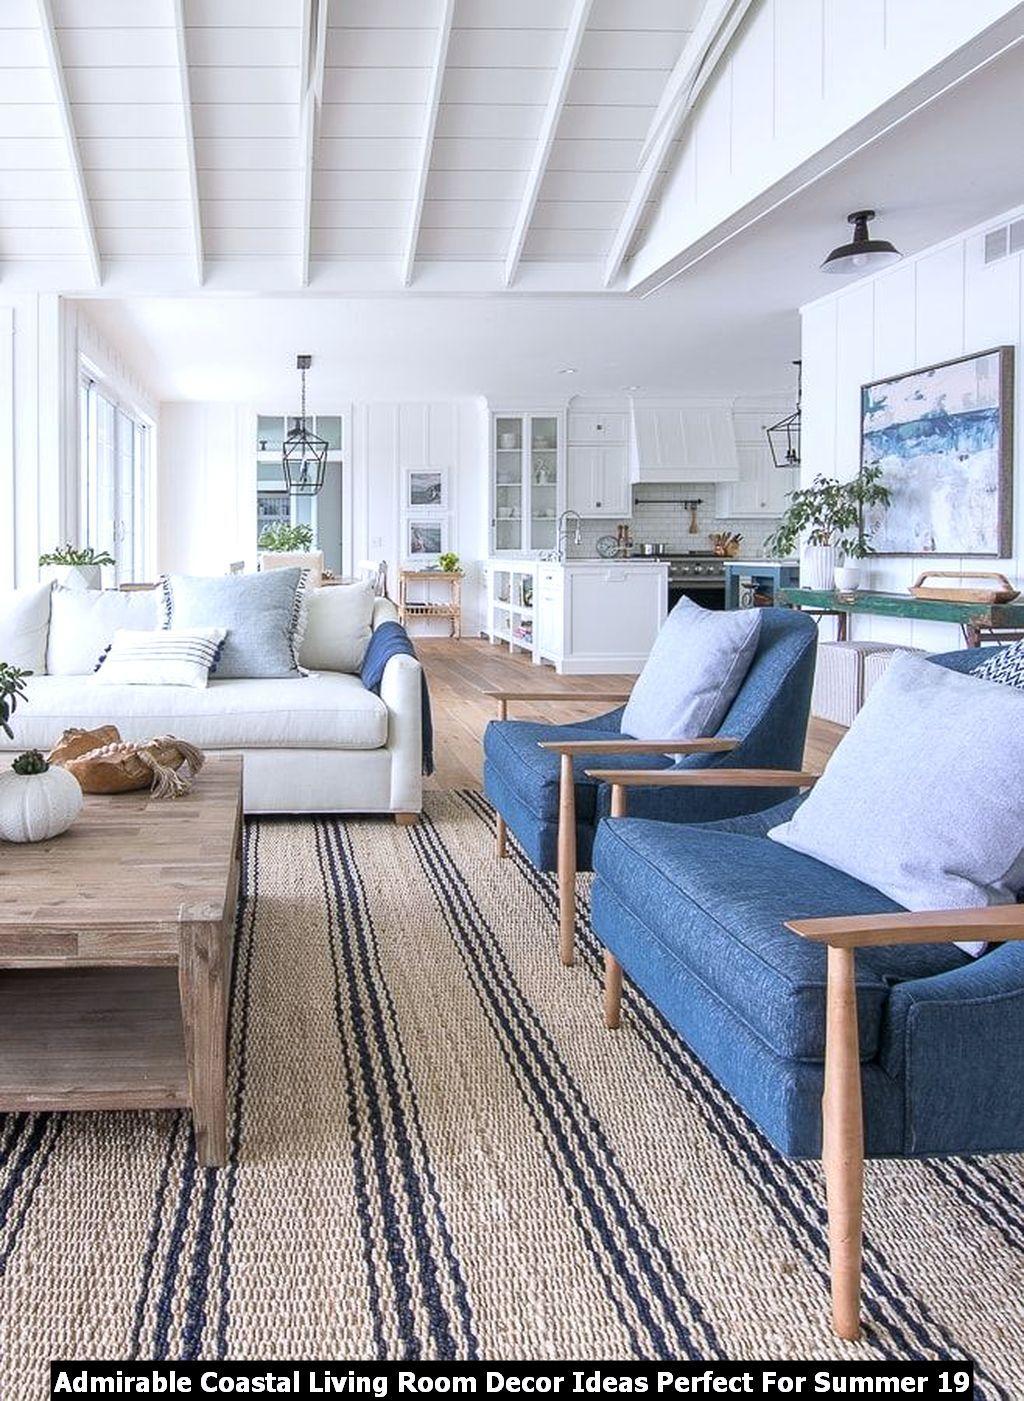 Admirable Coastal Living Room Decor Ideas Perfect For Summer Pimphomee Beach House Living Room Lake House Furniture Lake House Interior